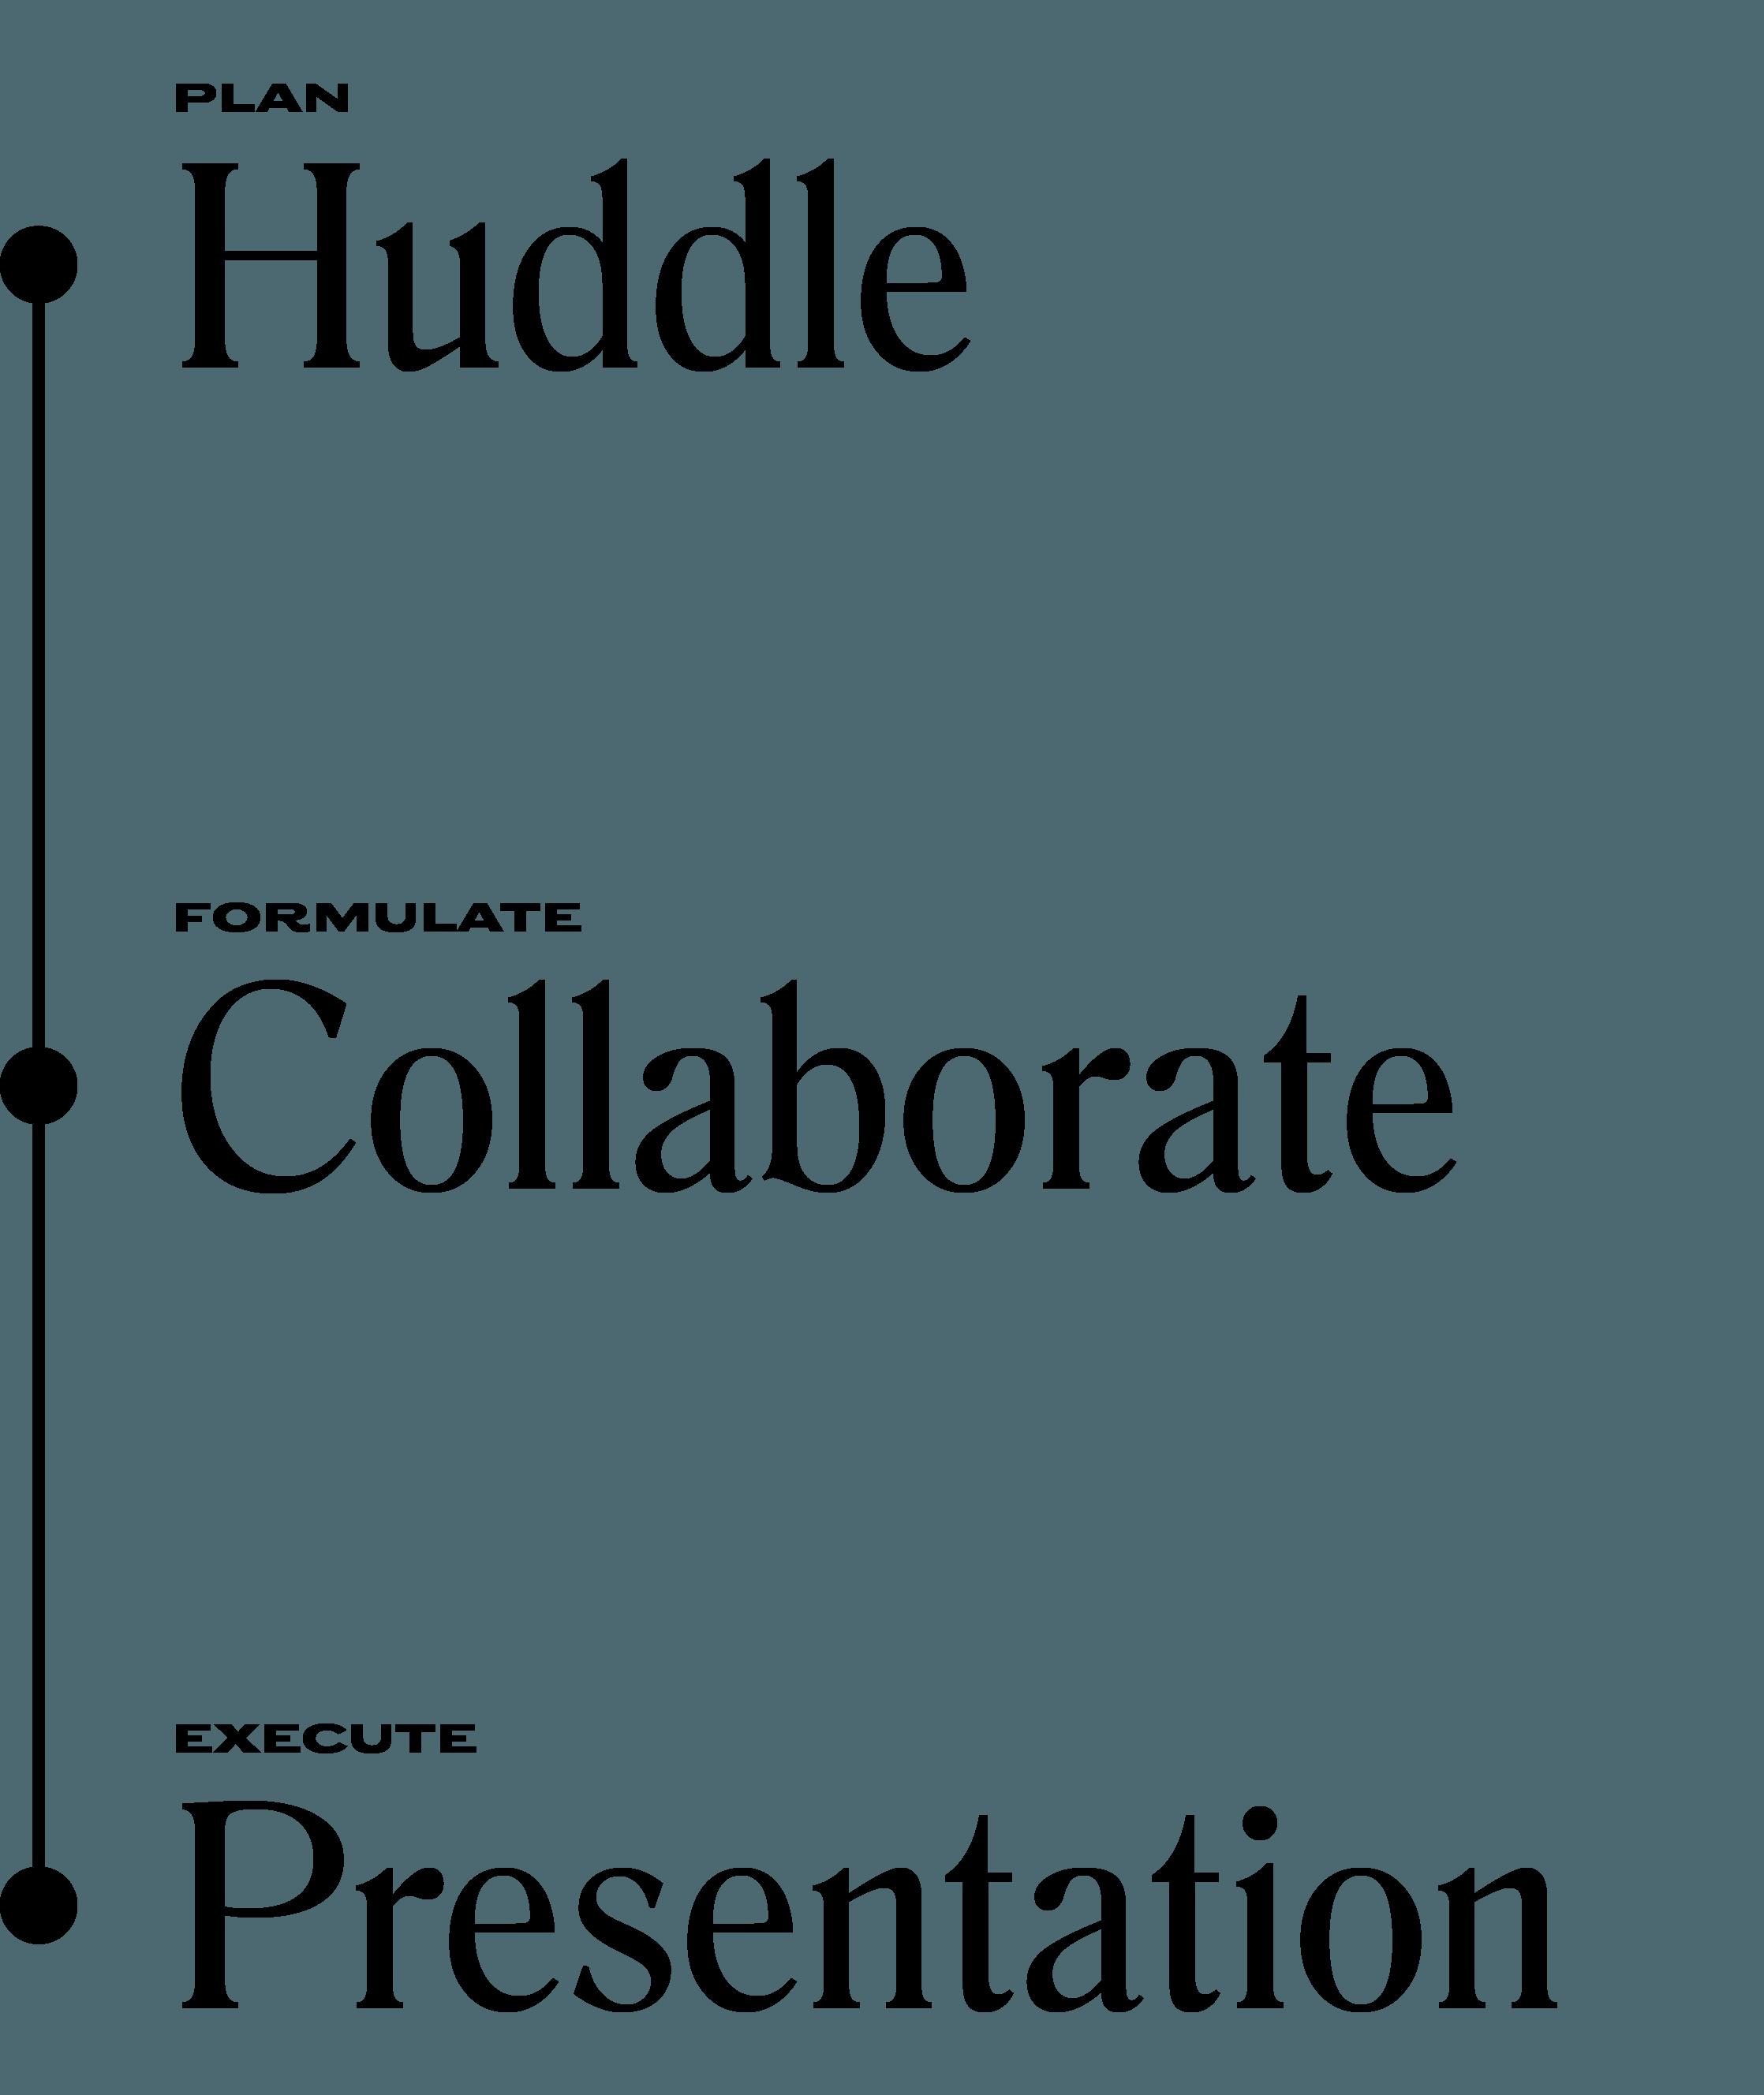 Americano_Presentation_ProcessSteps.png